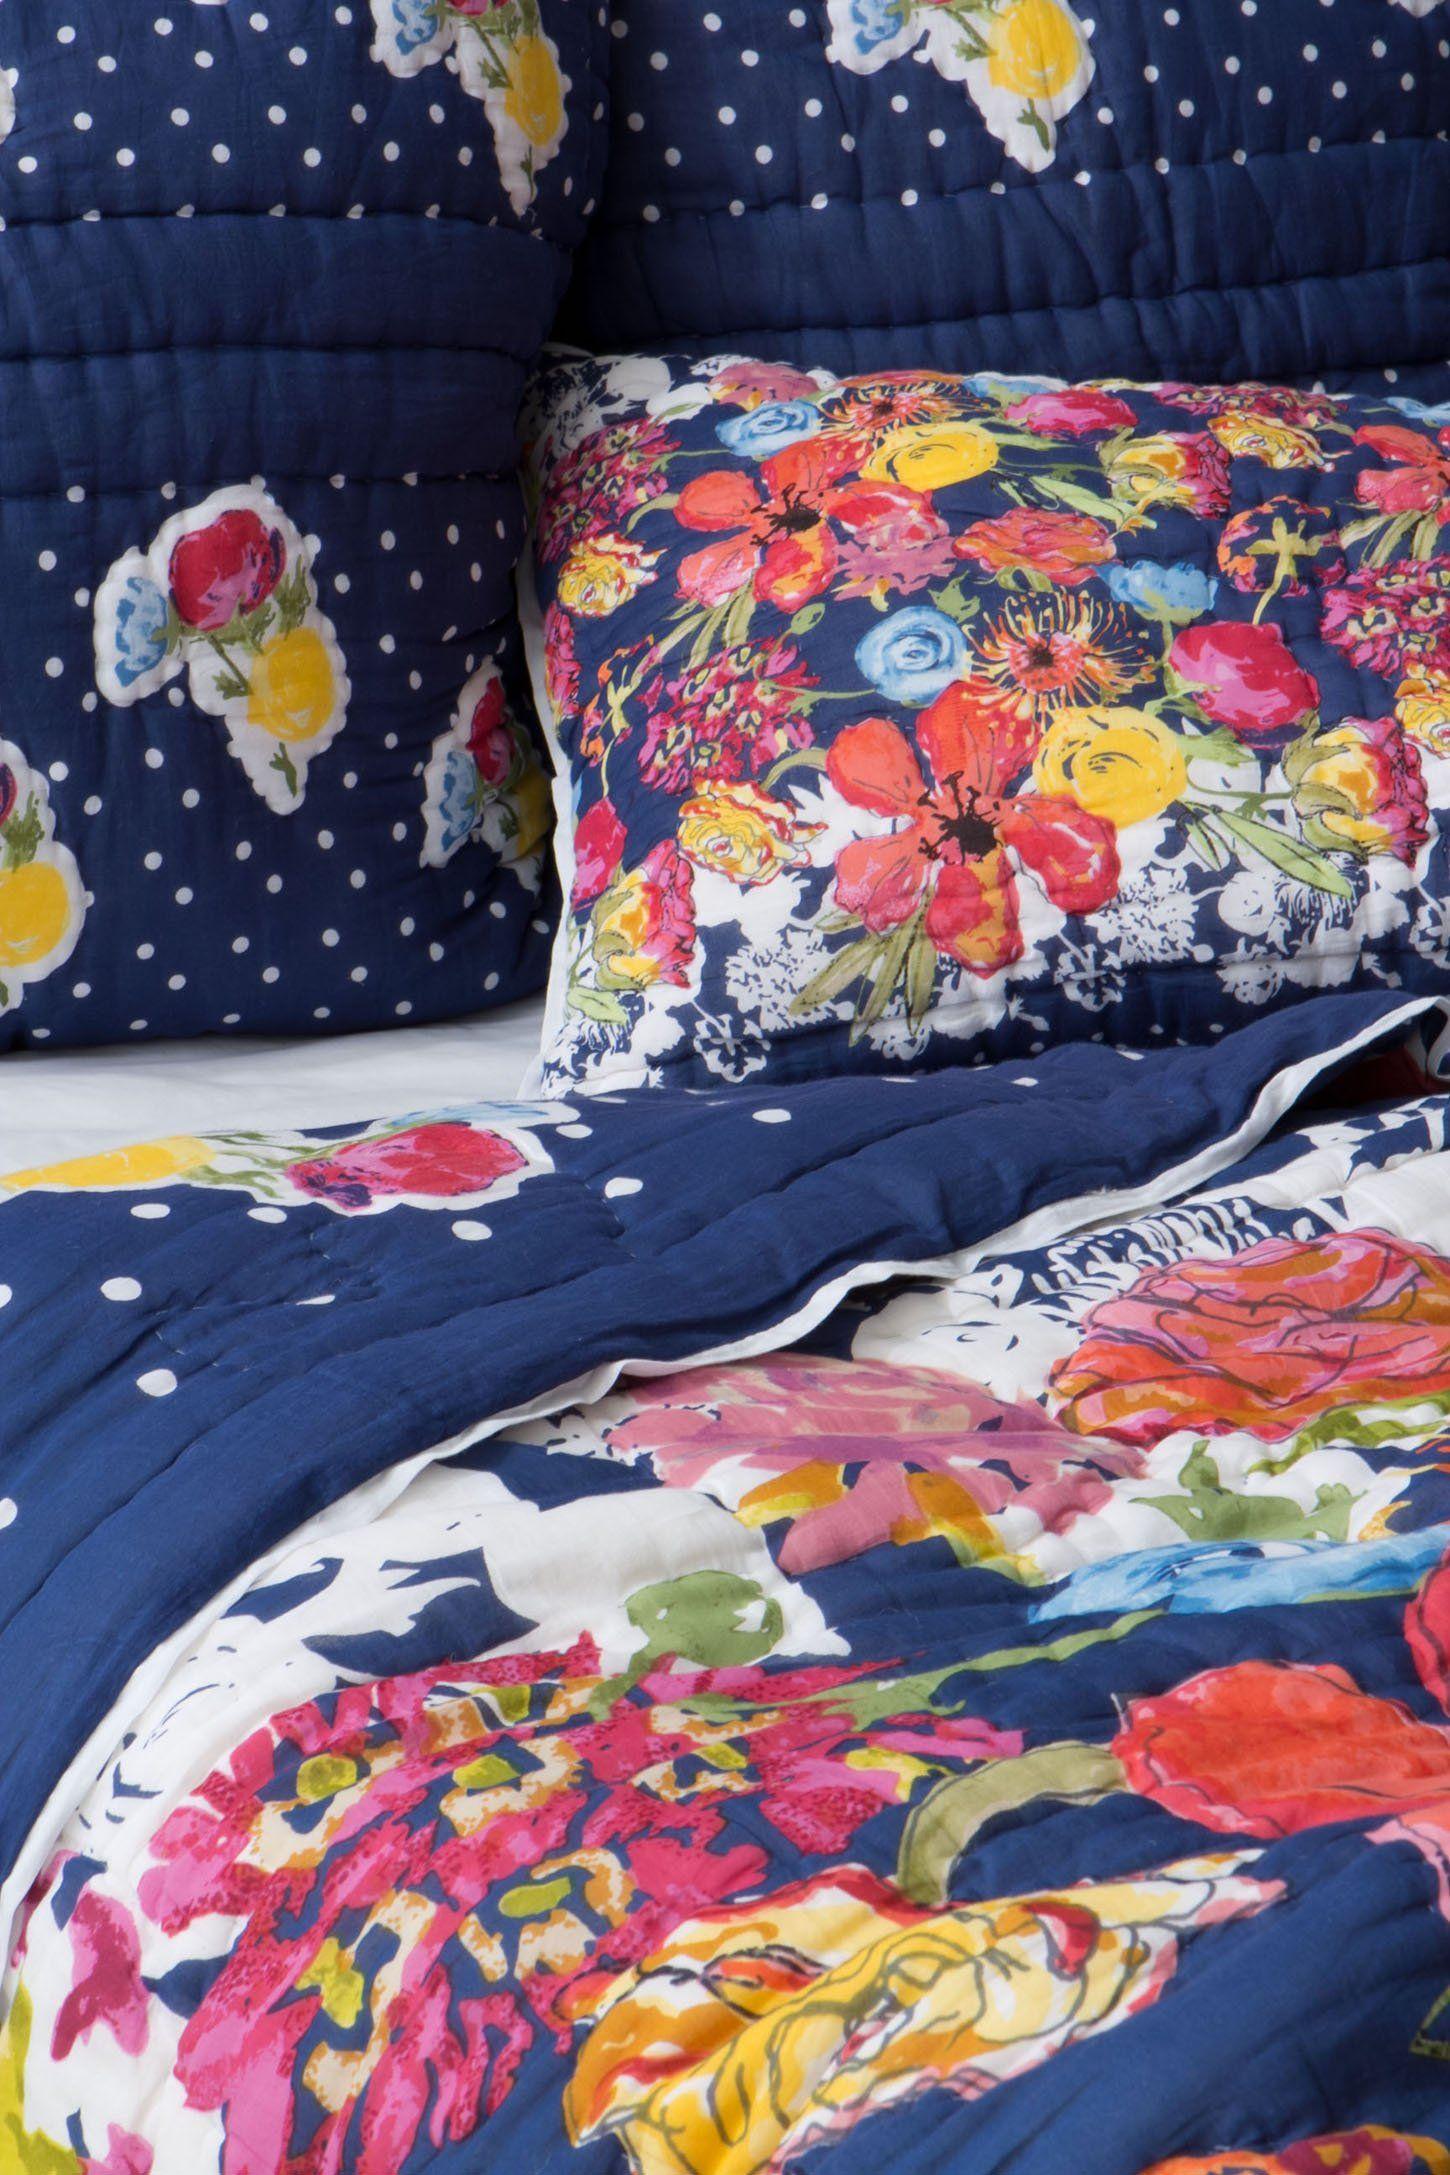 Jardin quilt anthropologie bedding colorful bedding